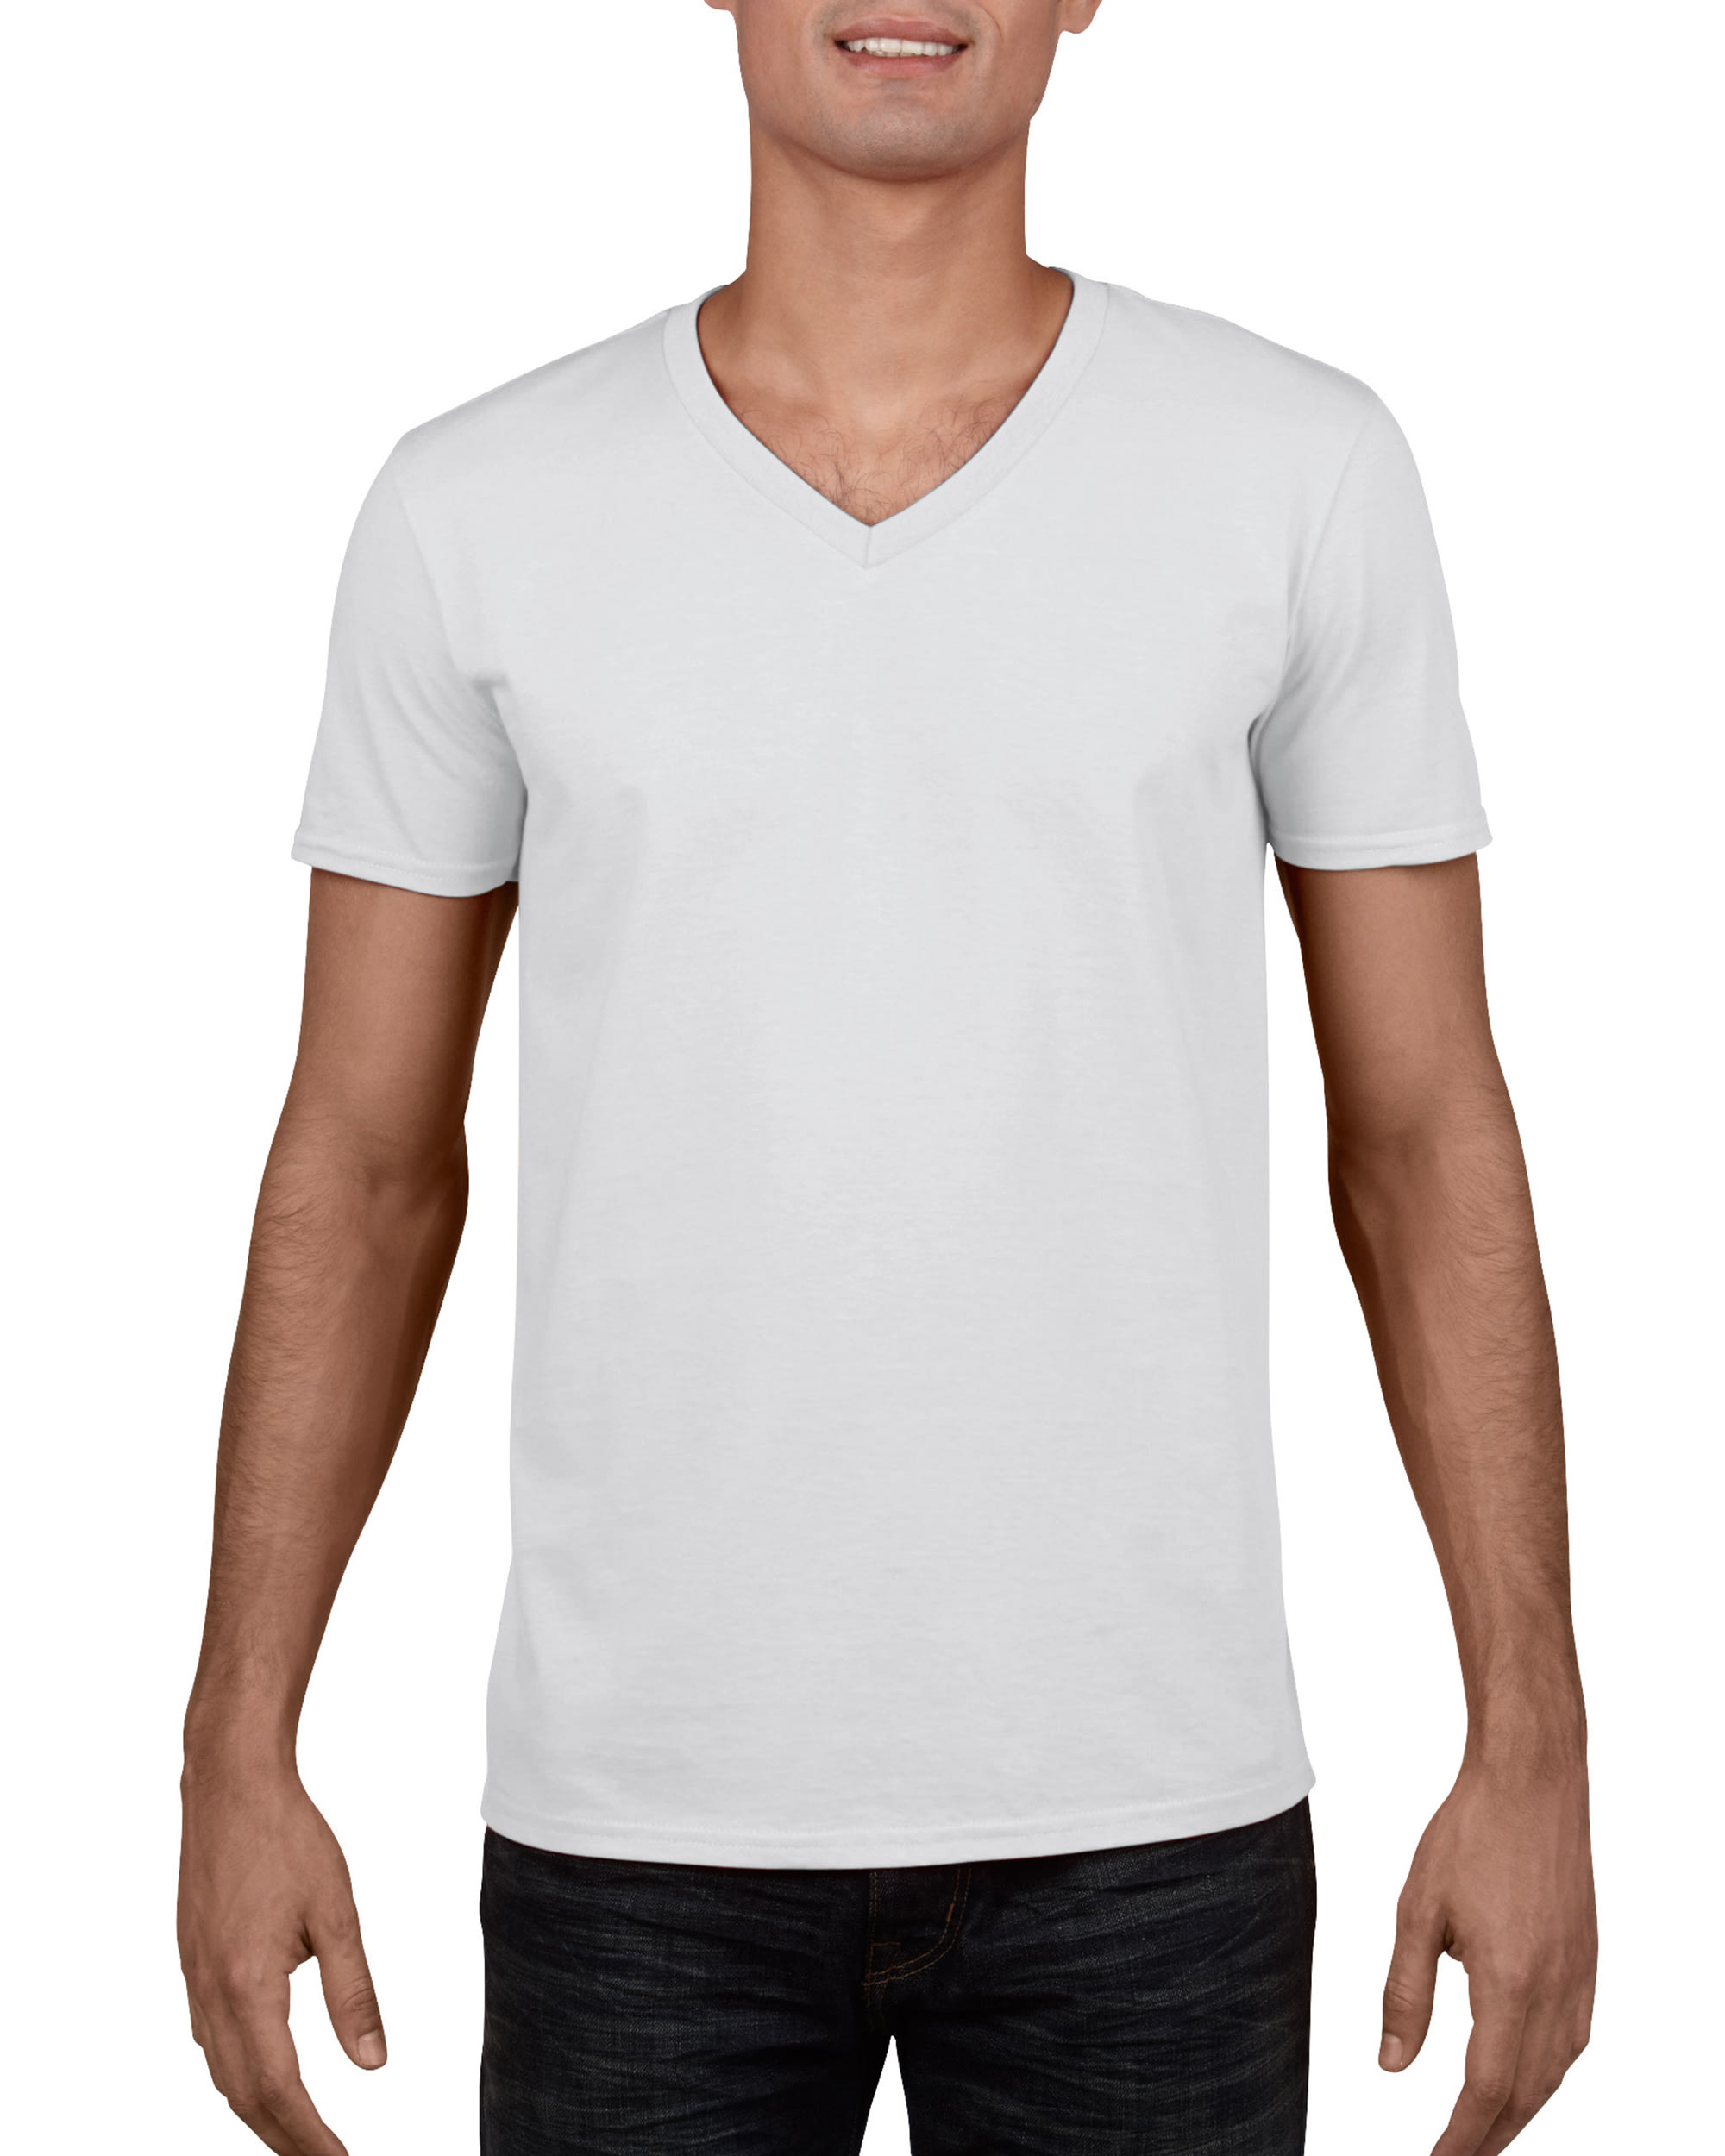 Custom T Shirts Vancouver Coastal Reign